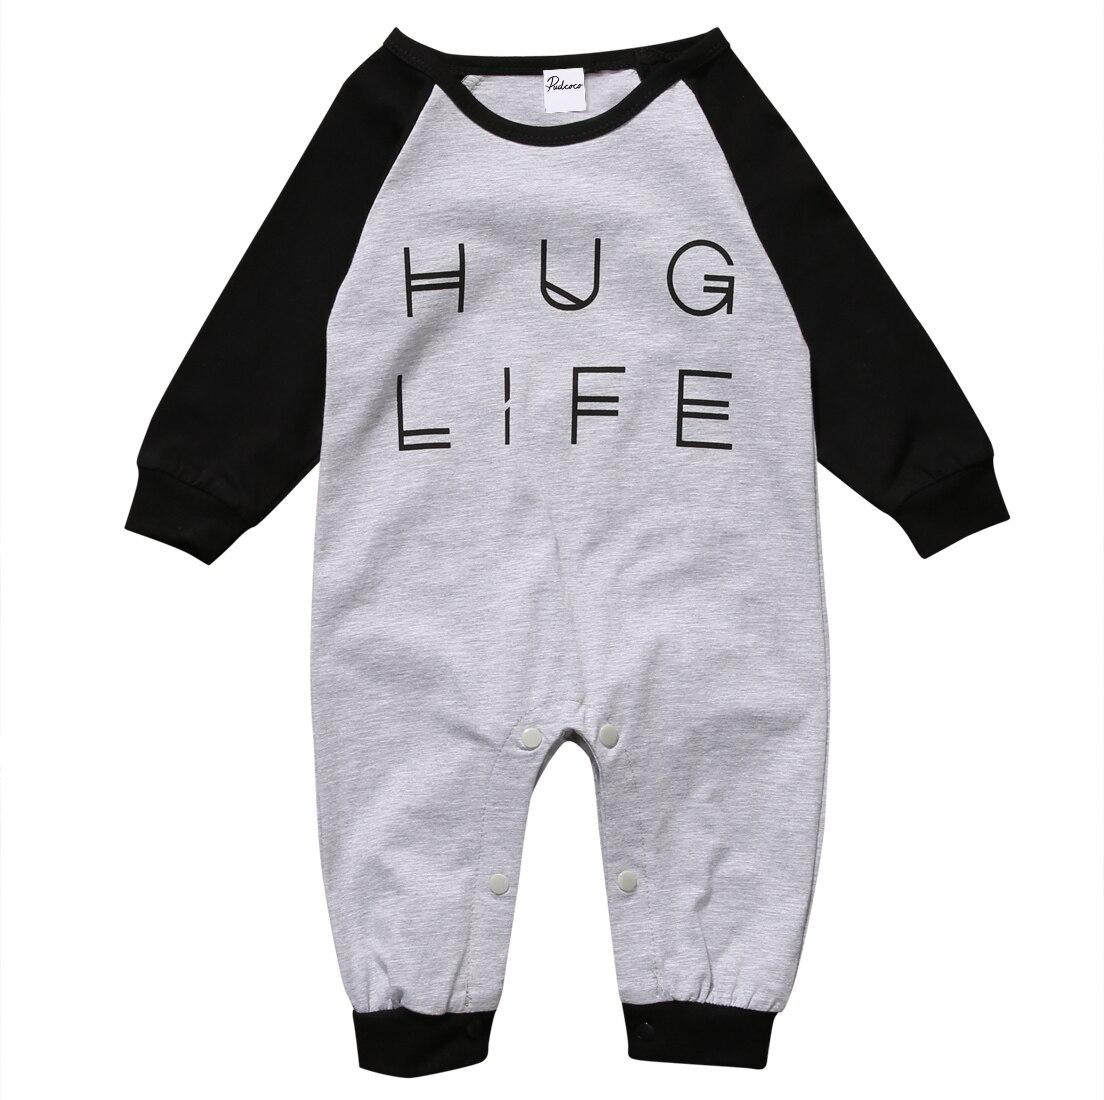 Mono de manga larga con estampado de Hug Life para bebé